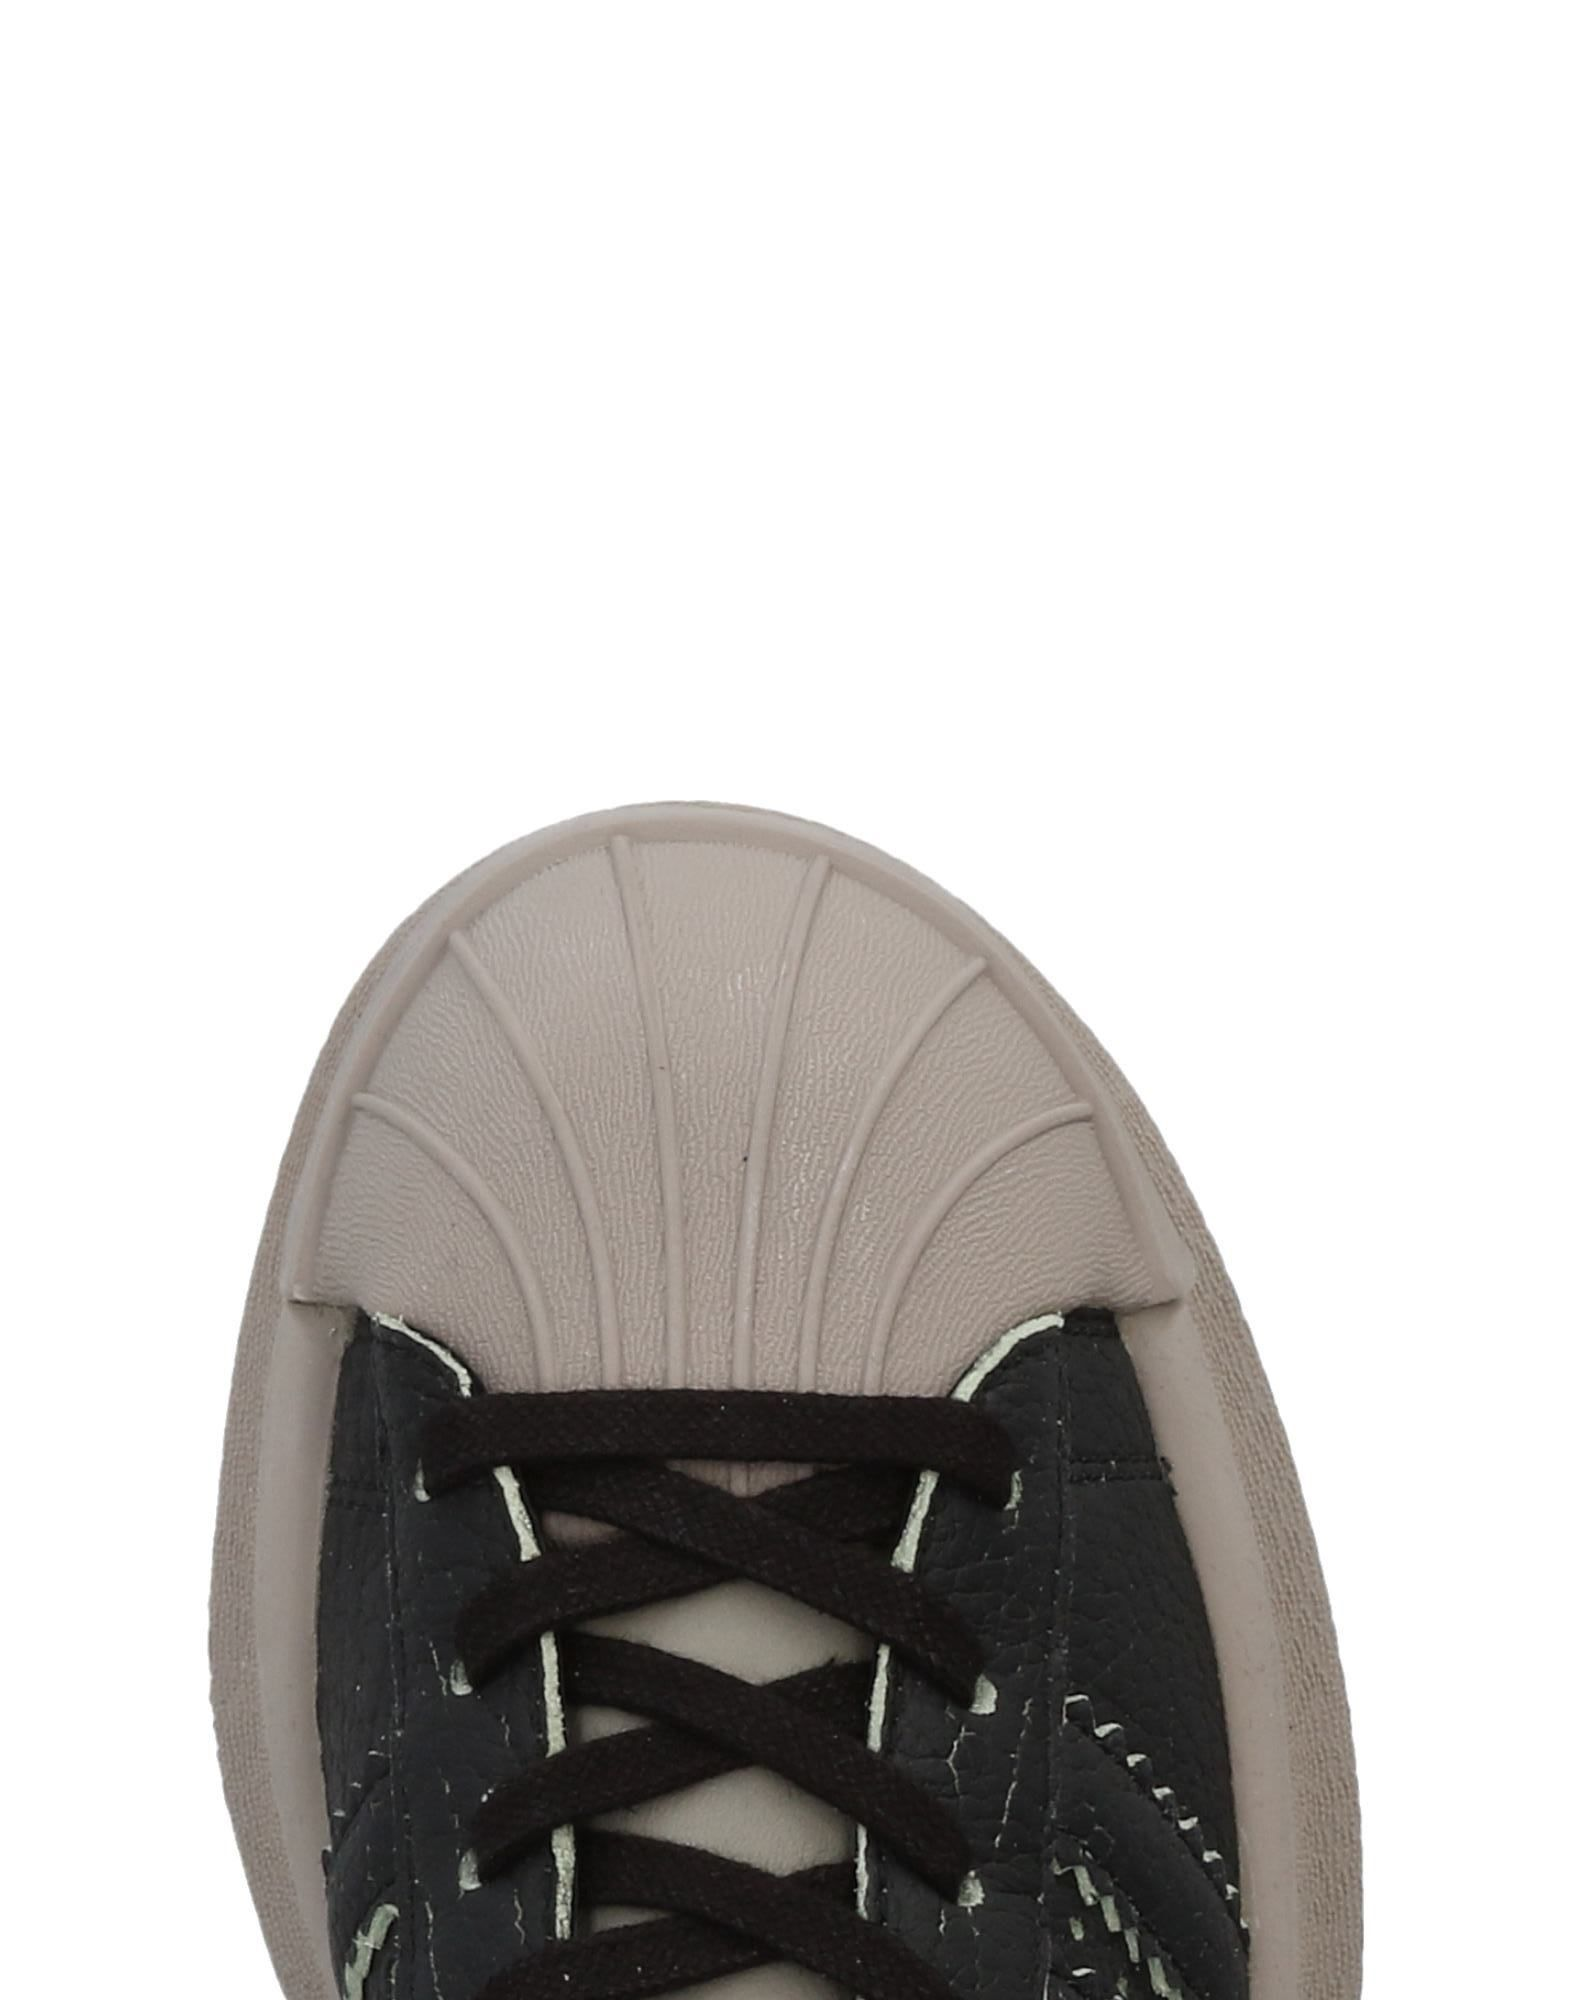 Rick Owens X Adidas Sneakers aussehende Damen  11391759NVGünstige gut aussehende Sneakers Schuhe c27ca4